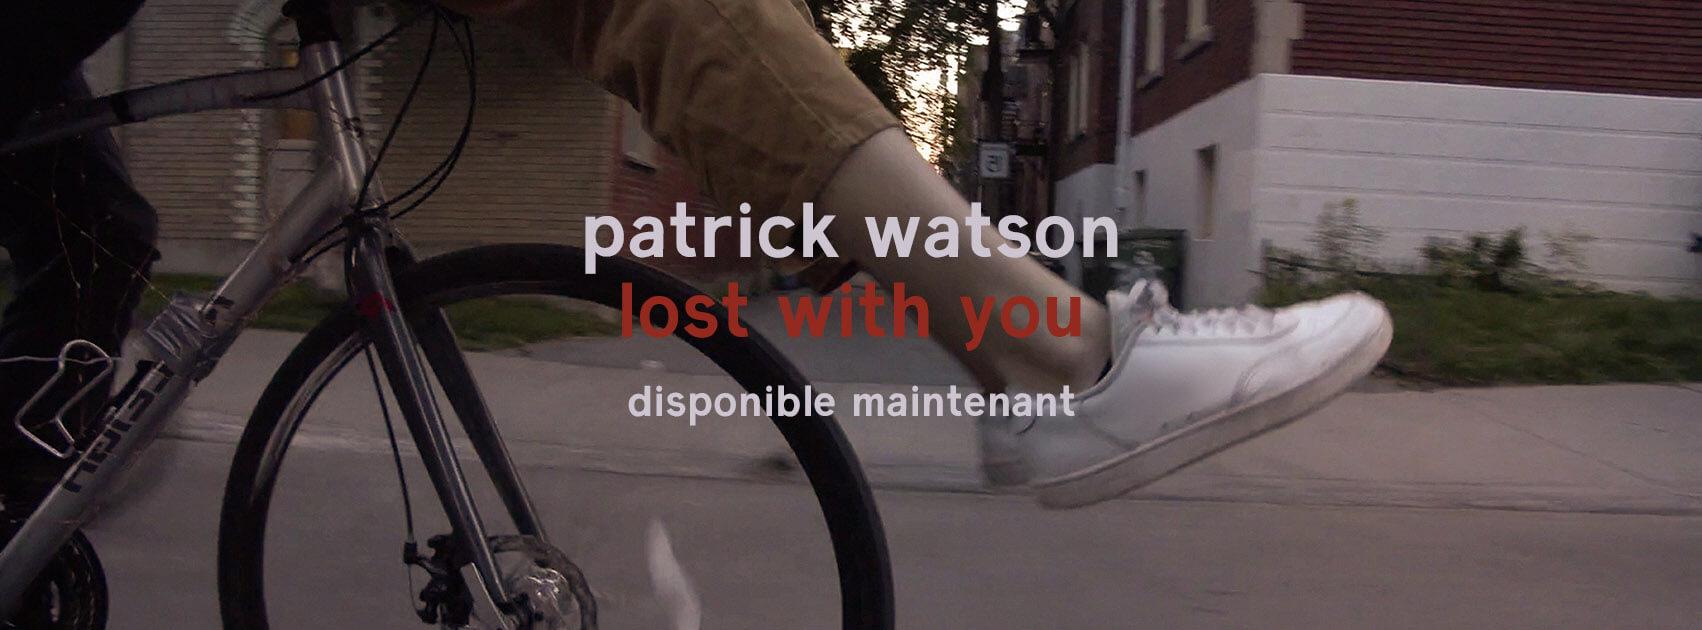 PatrickWatson-Lostwithyou-SCRWebsite-FR